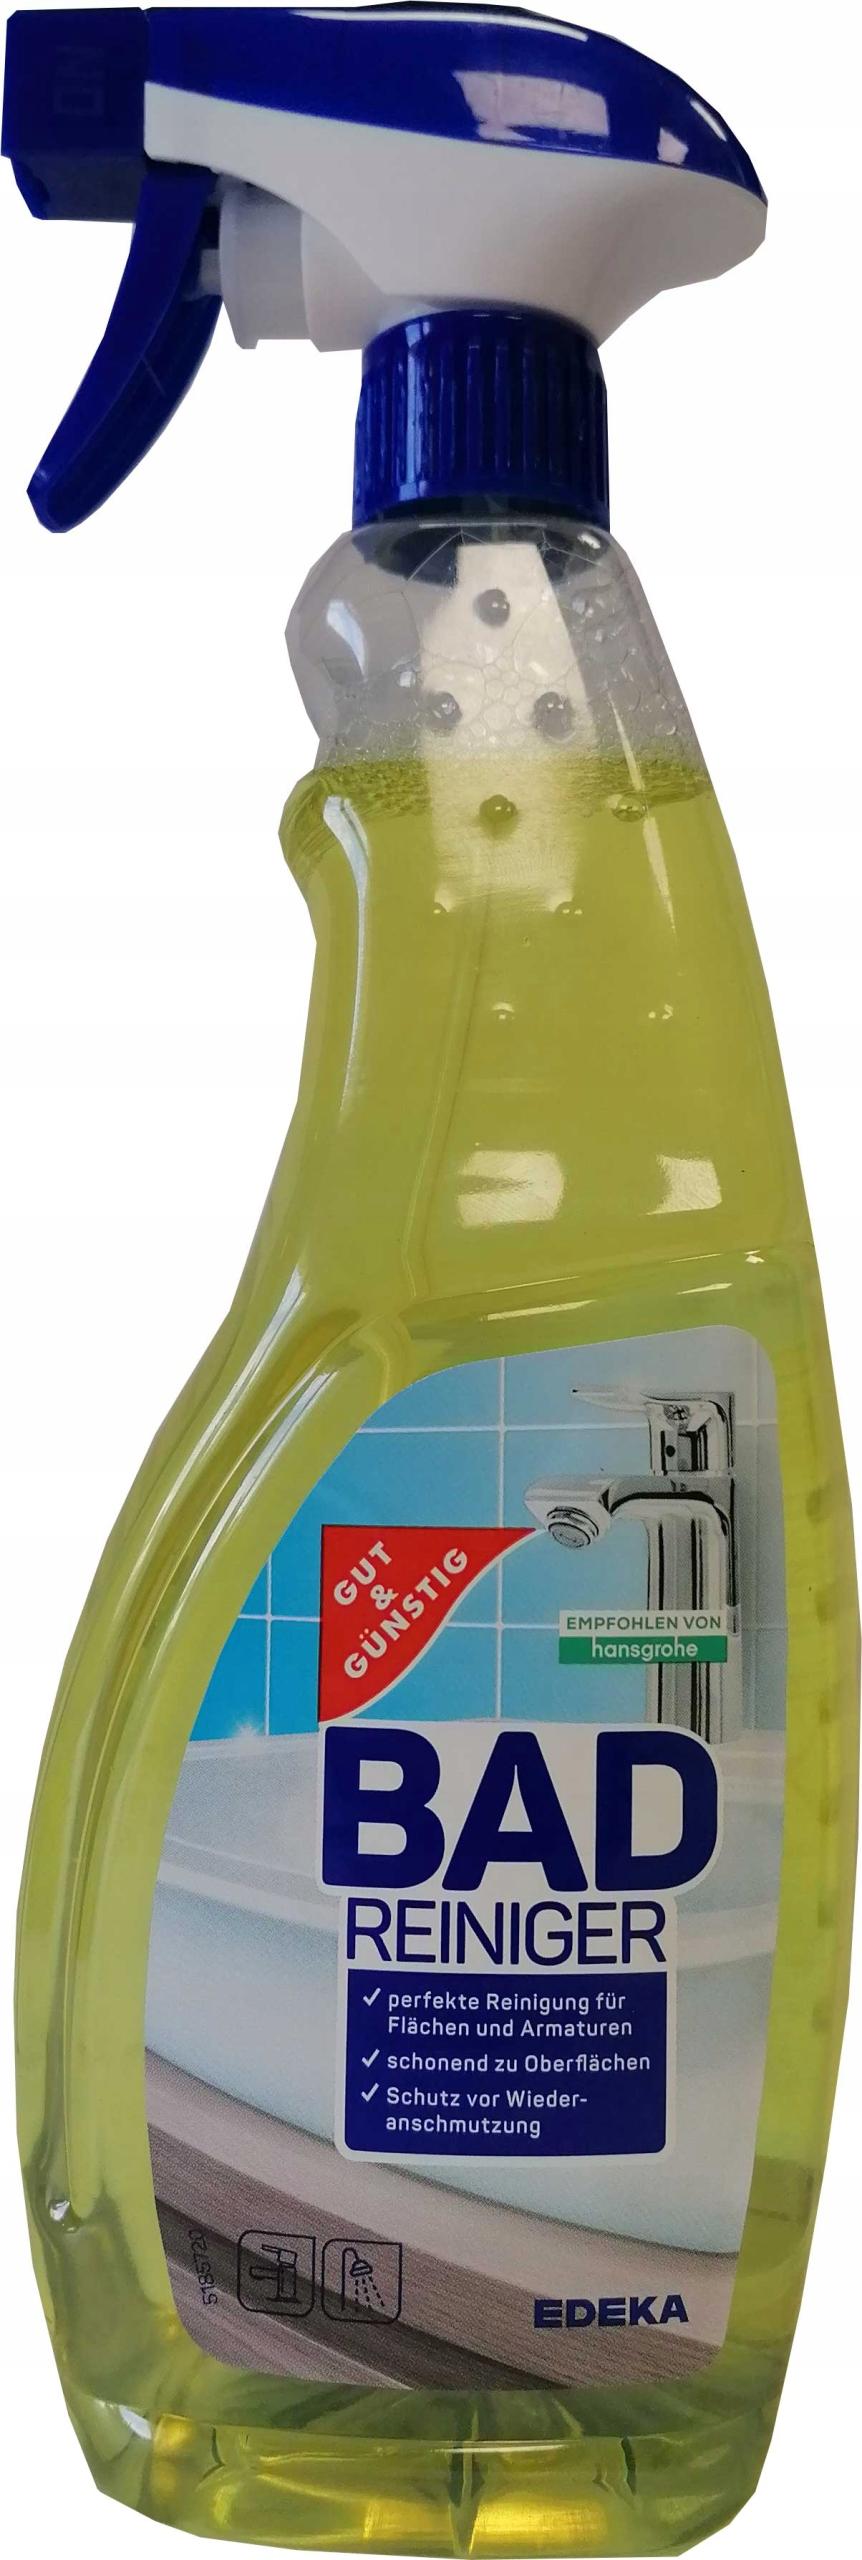 G G Bad Reiniger для чистки ванных комнат 1 л